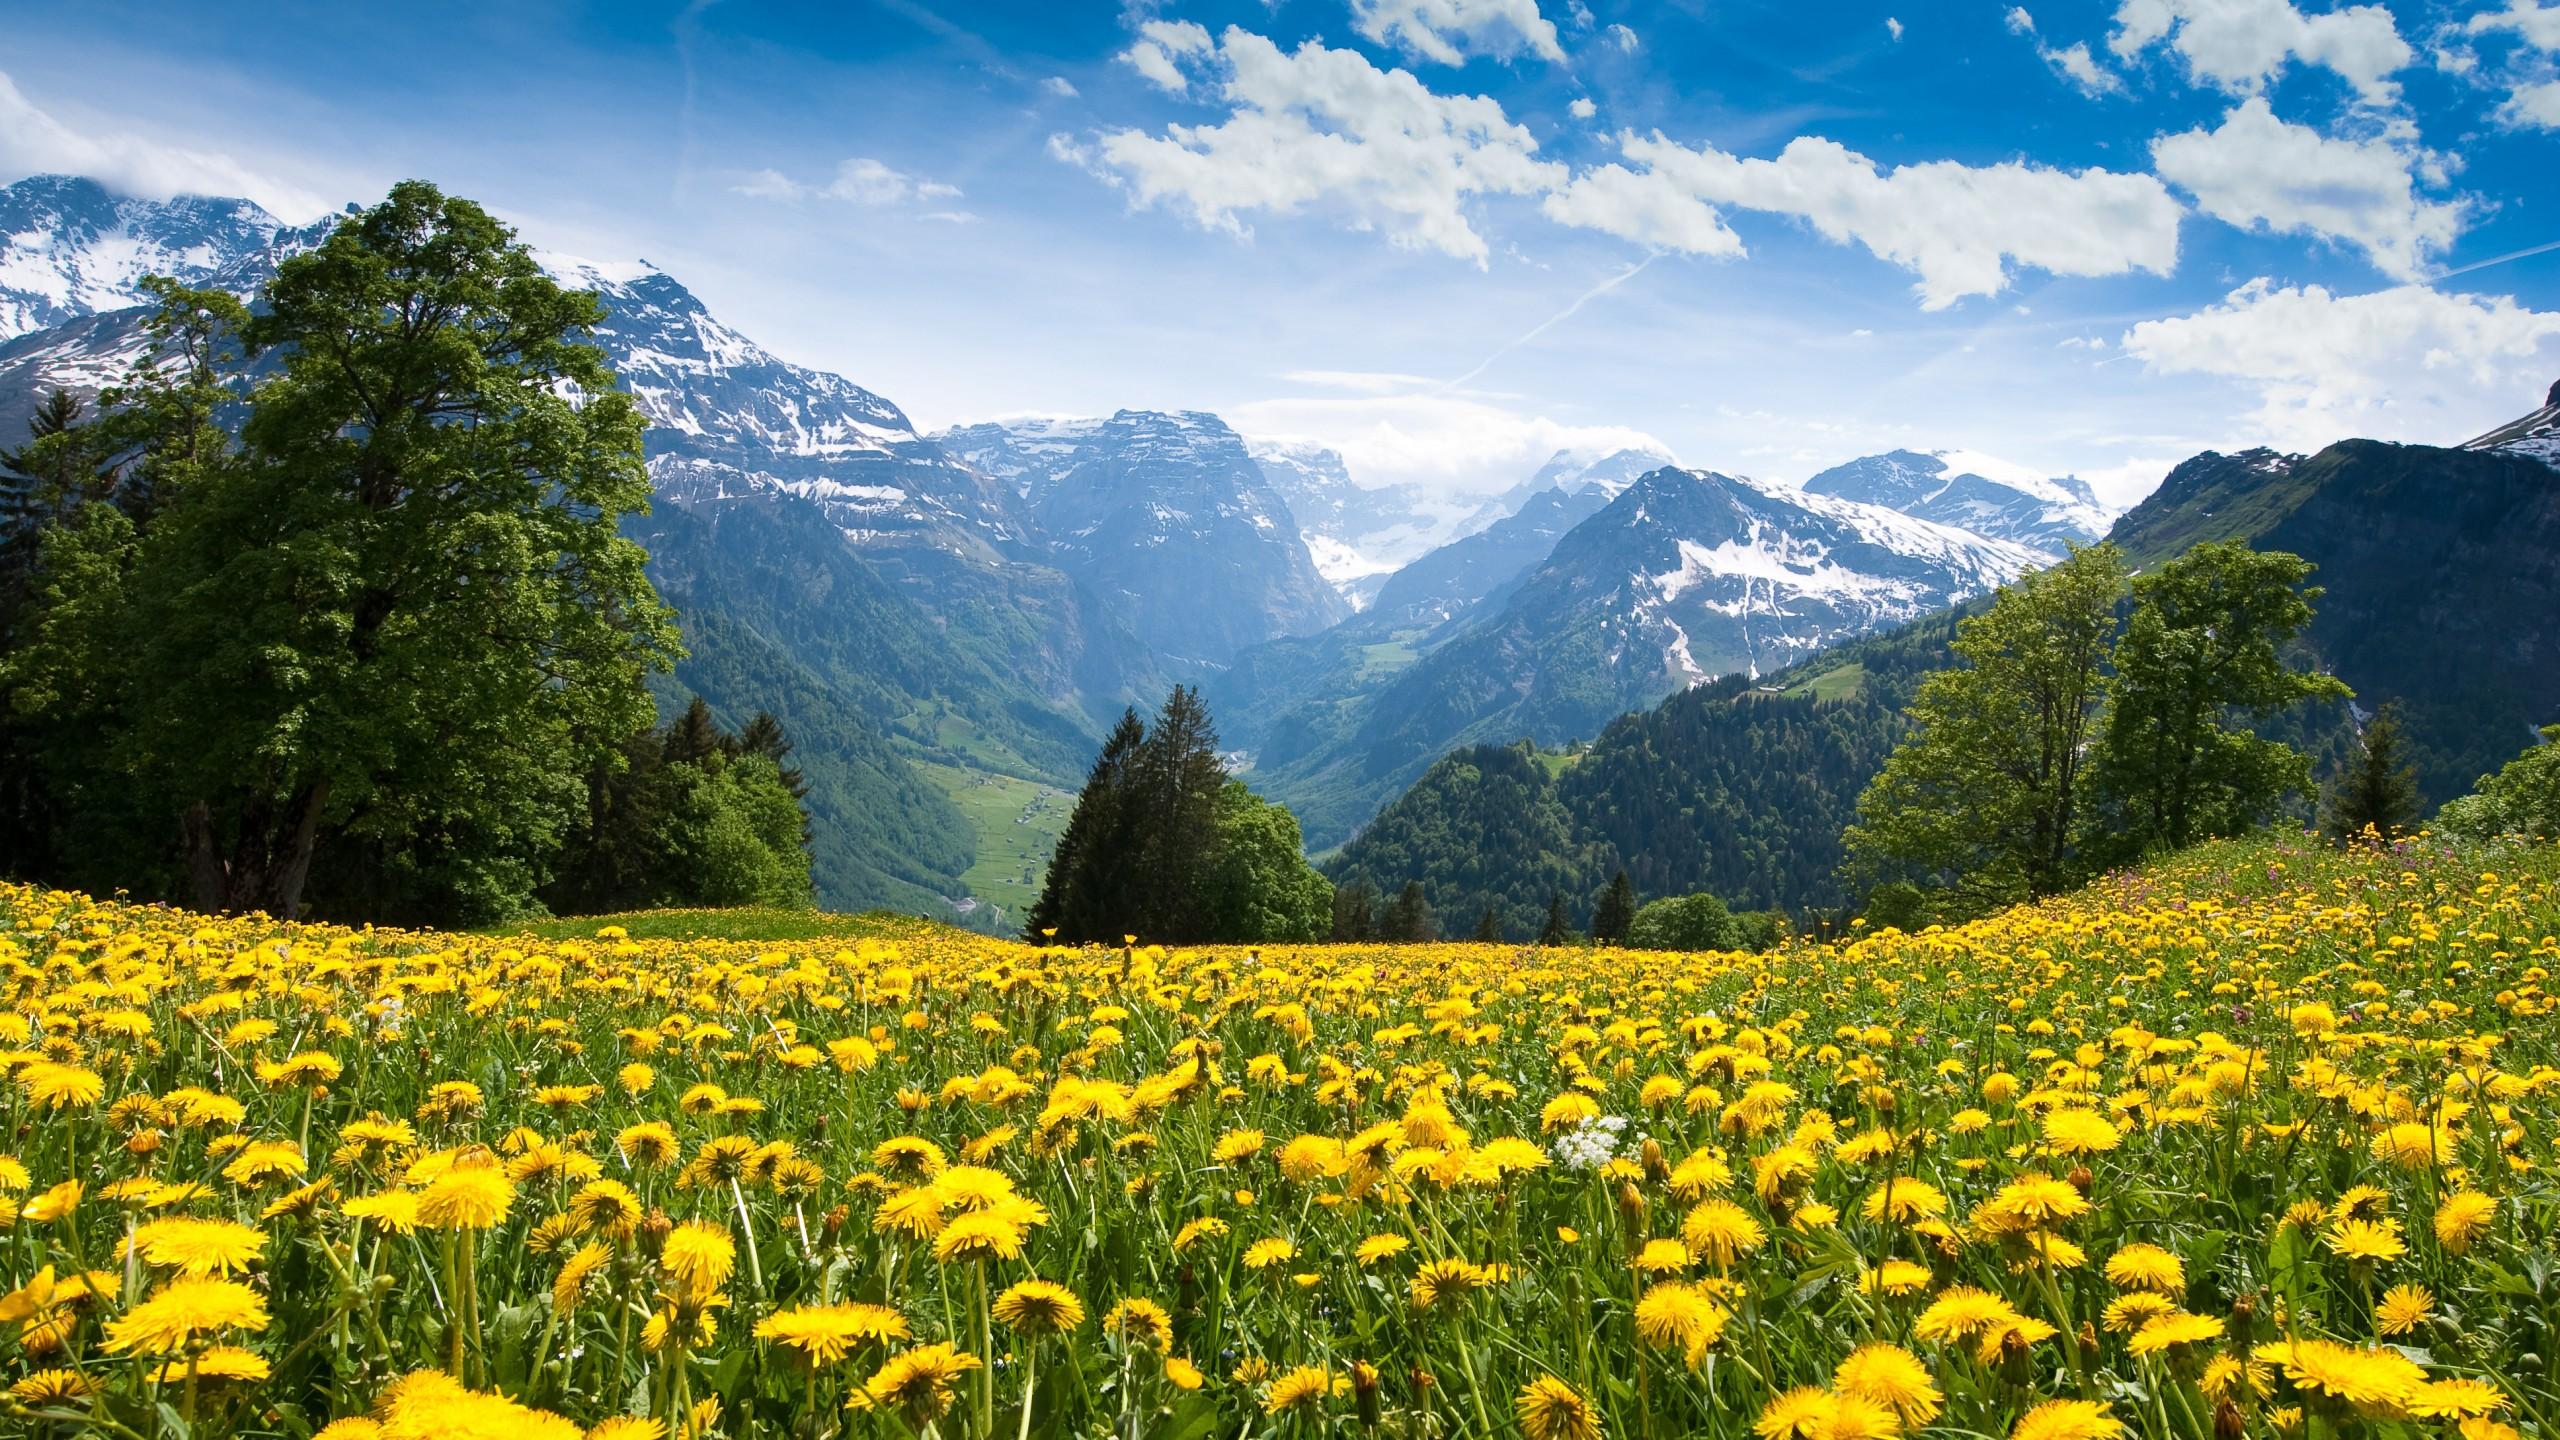 Nature Desktop Background - HD Wallpaper